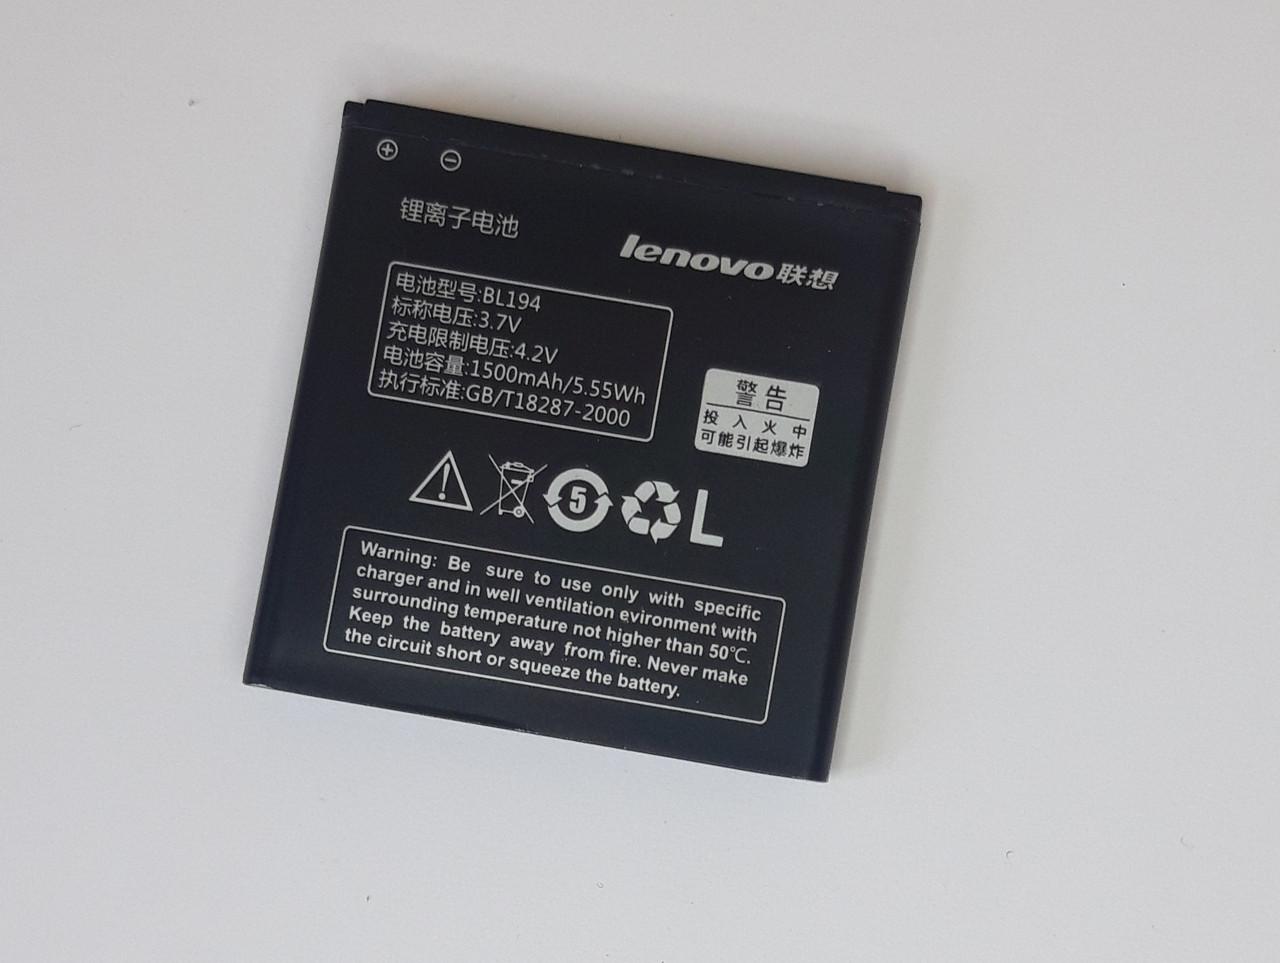 Аккумулятор Lenovo BL194 A288t / A298t / A520 / A660 / A698t / A690 / A326 / A5 1500 mAh оригинал б.у